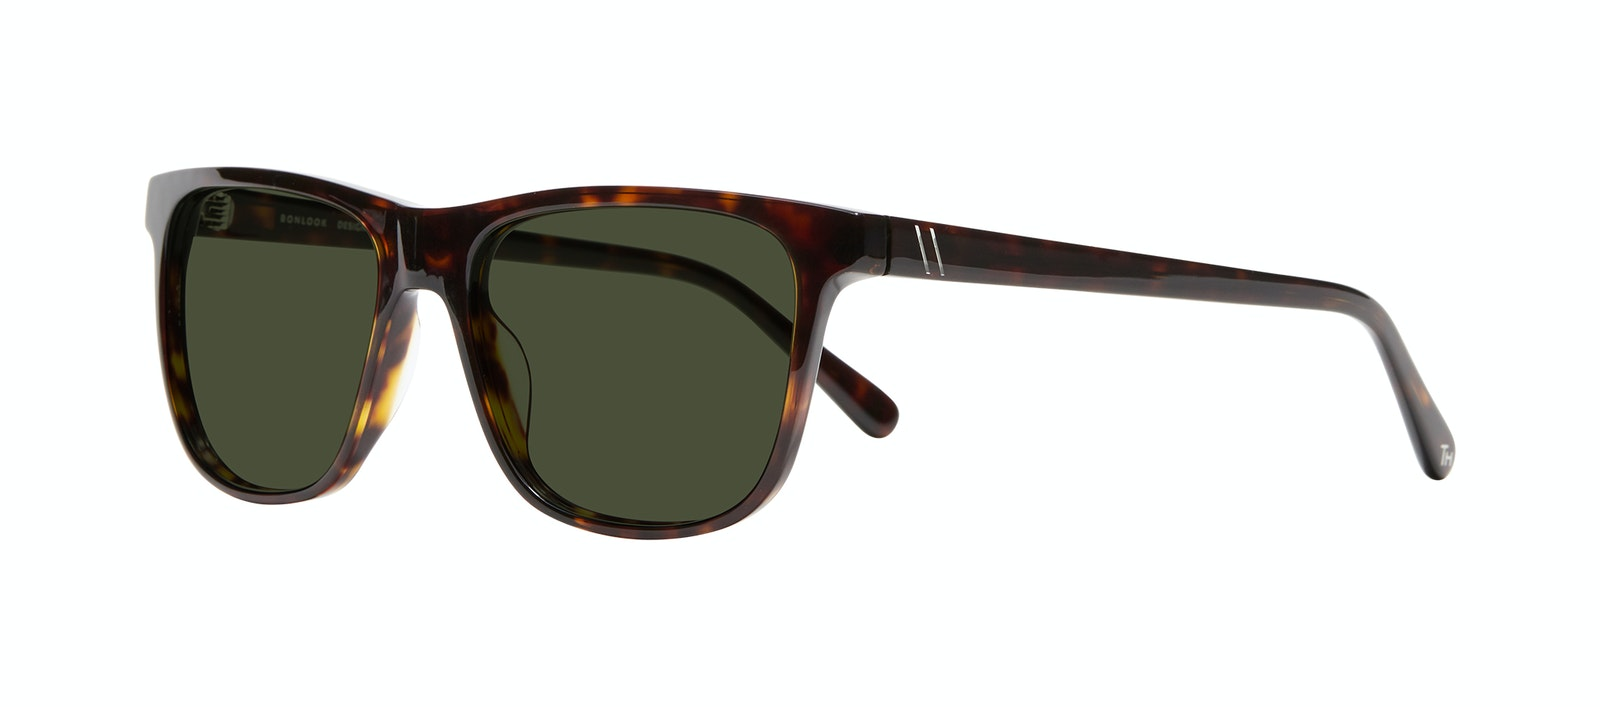 Affordable Fashion Glasses Square Sunglasses Men River Tortoise Tilt